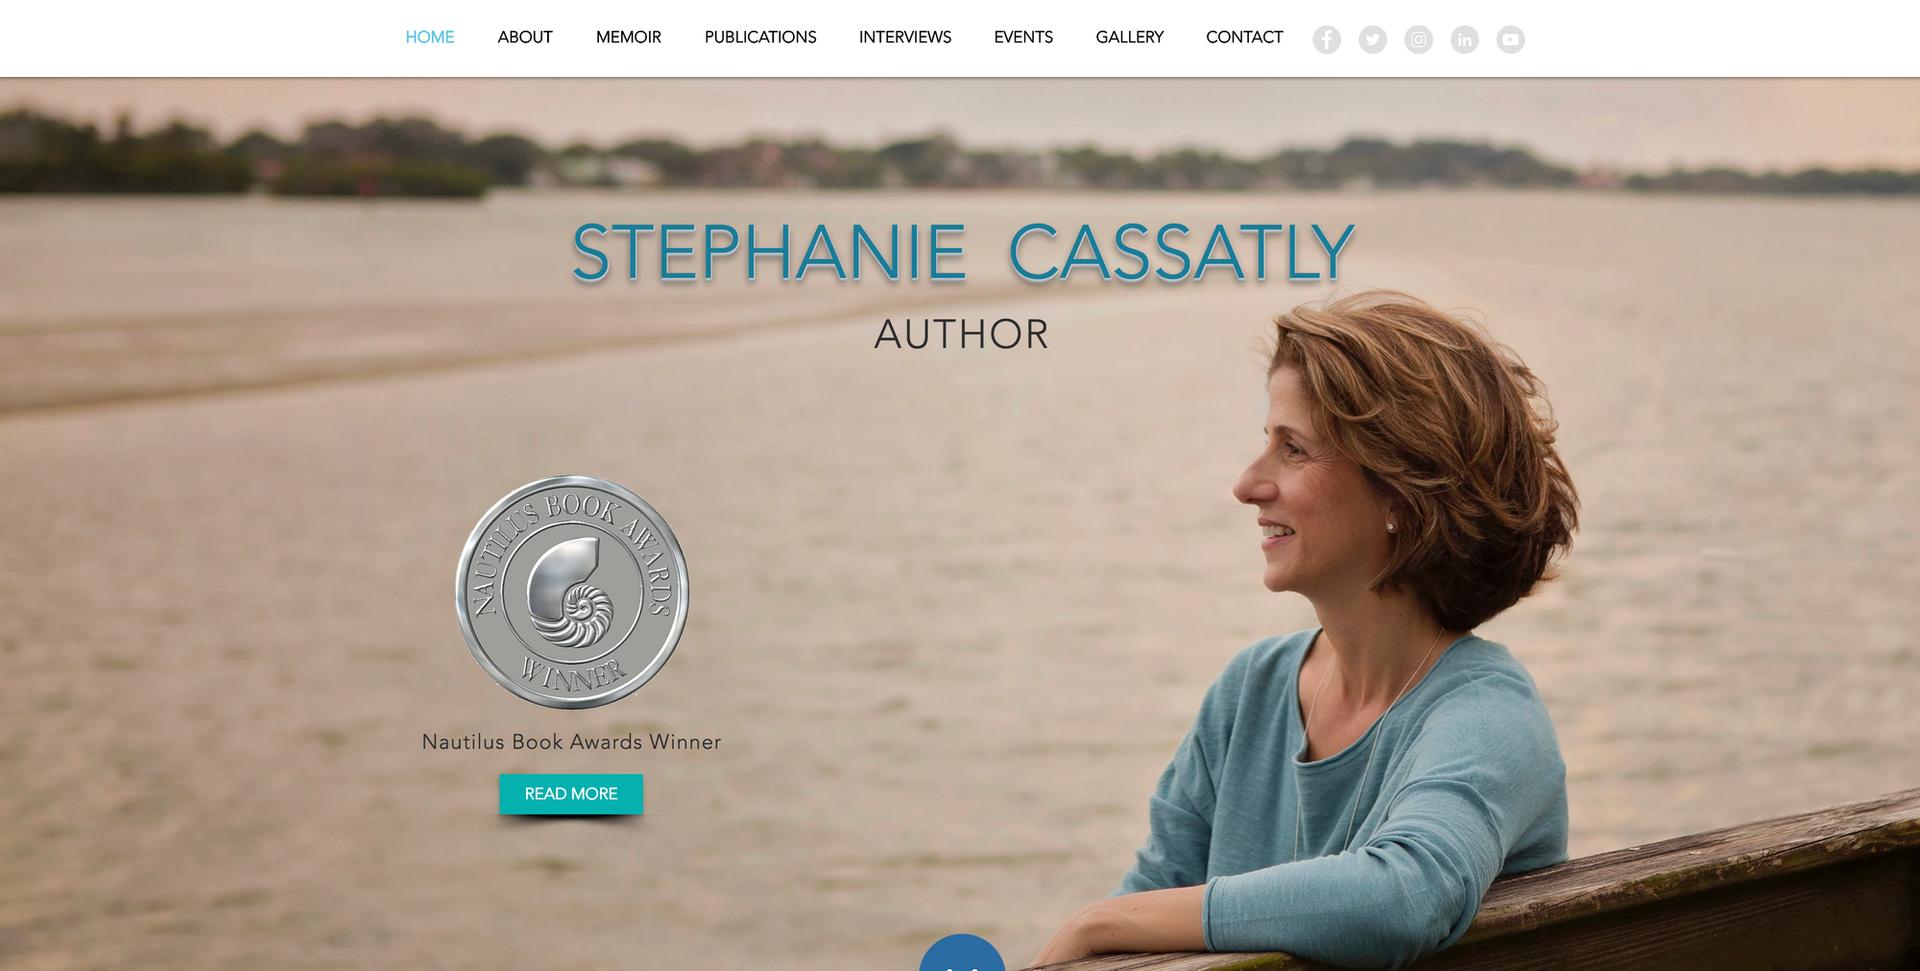 Stephanie Cassatly